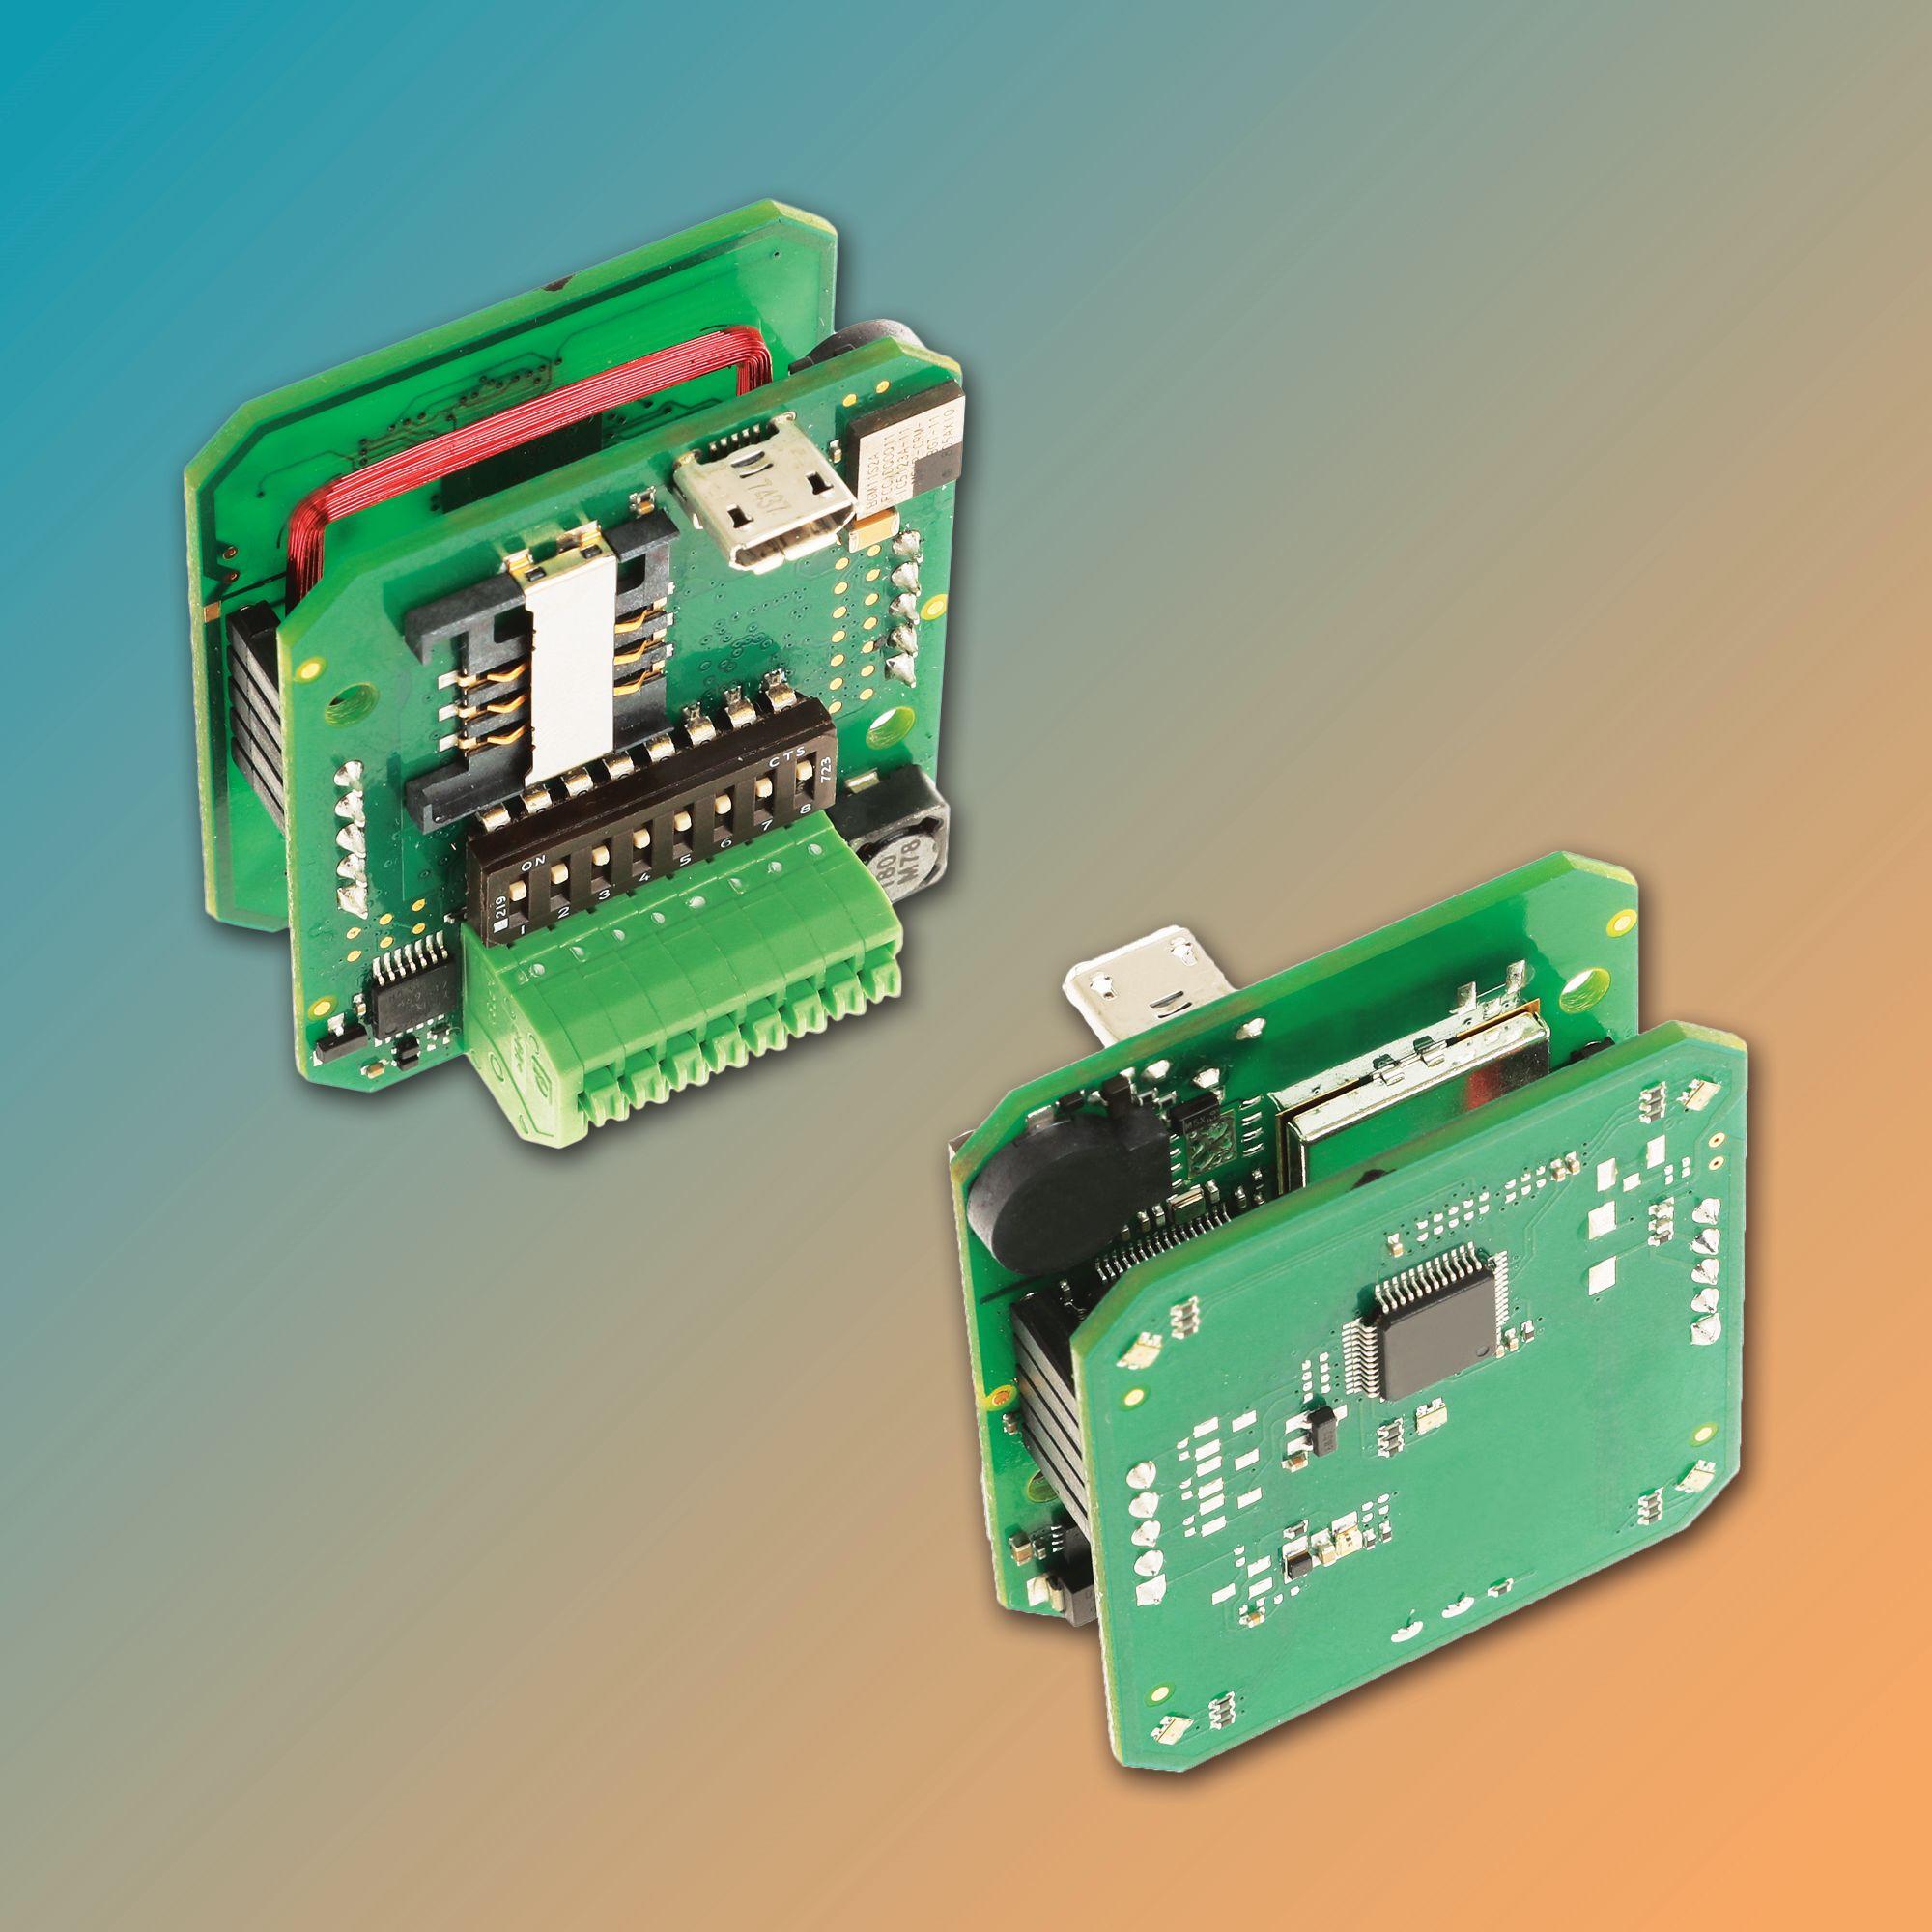 Kompaktes OEM-RFID-Lese-/Schreibgerät